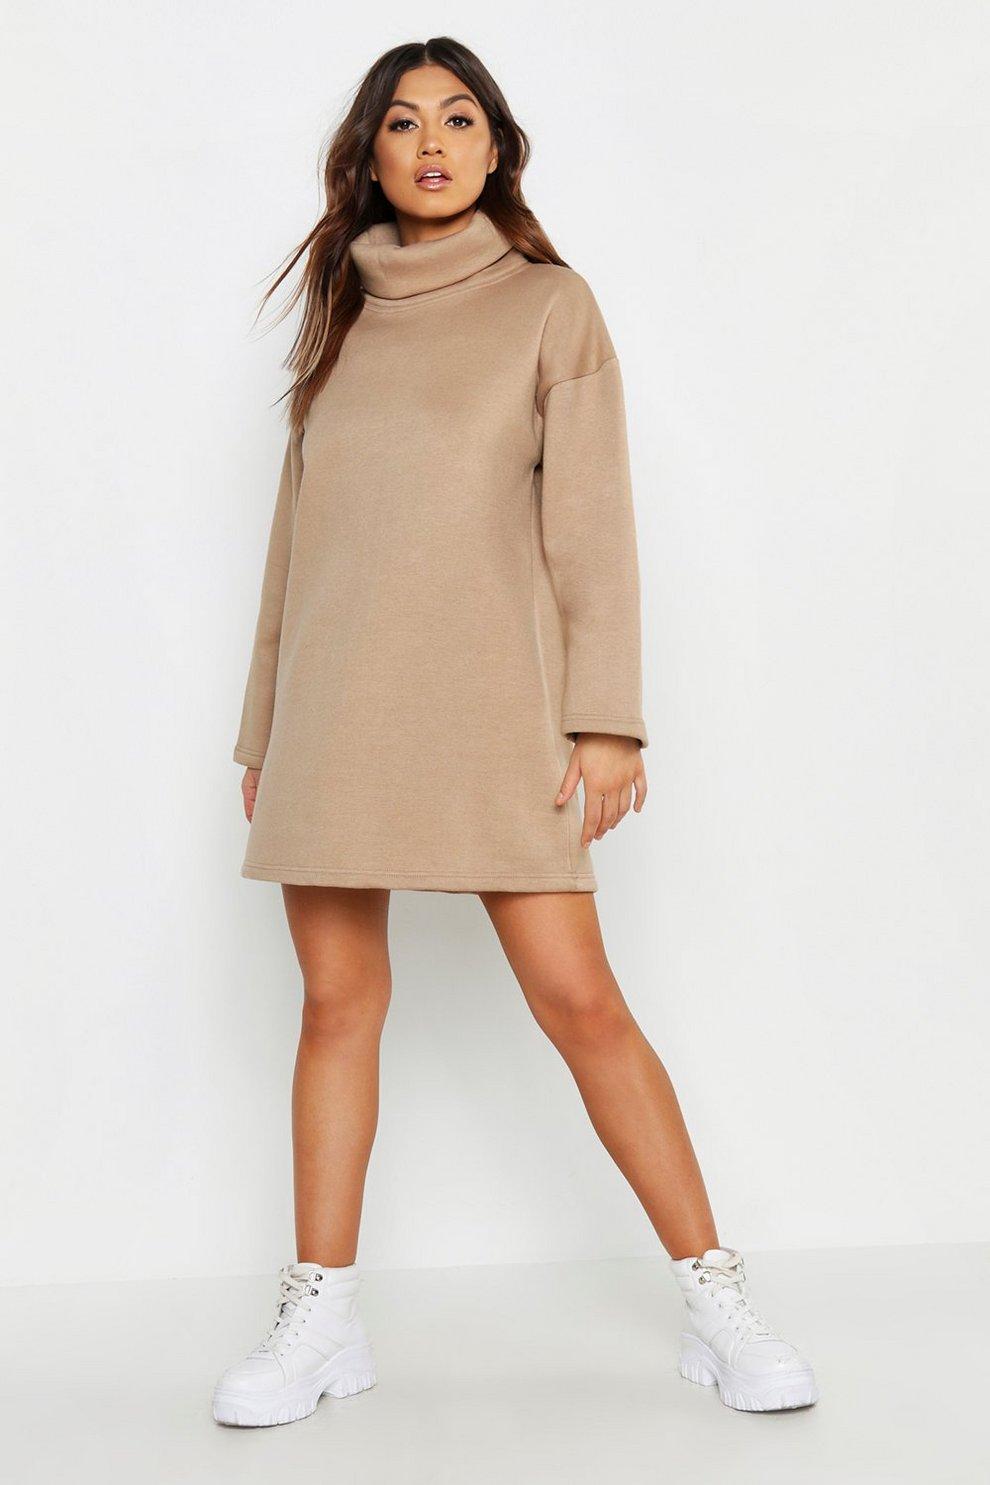 70a44e03e5b High Neck Oversized Sweatshirt Dress